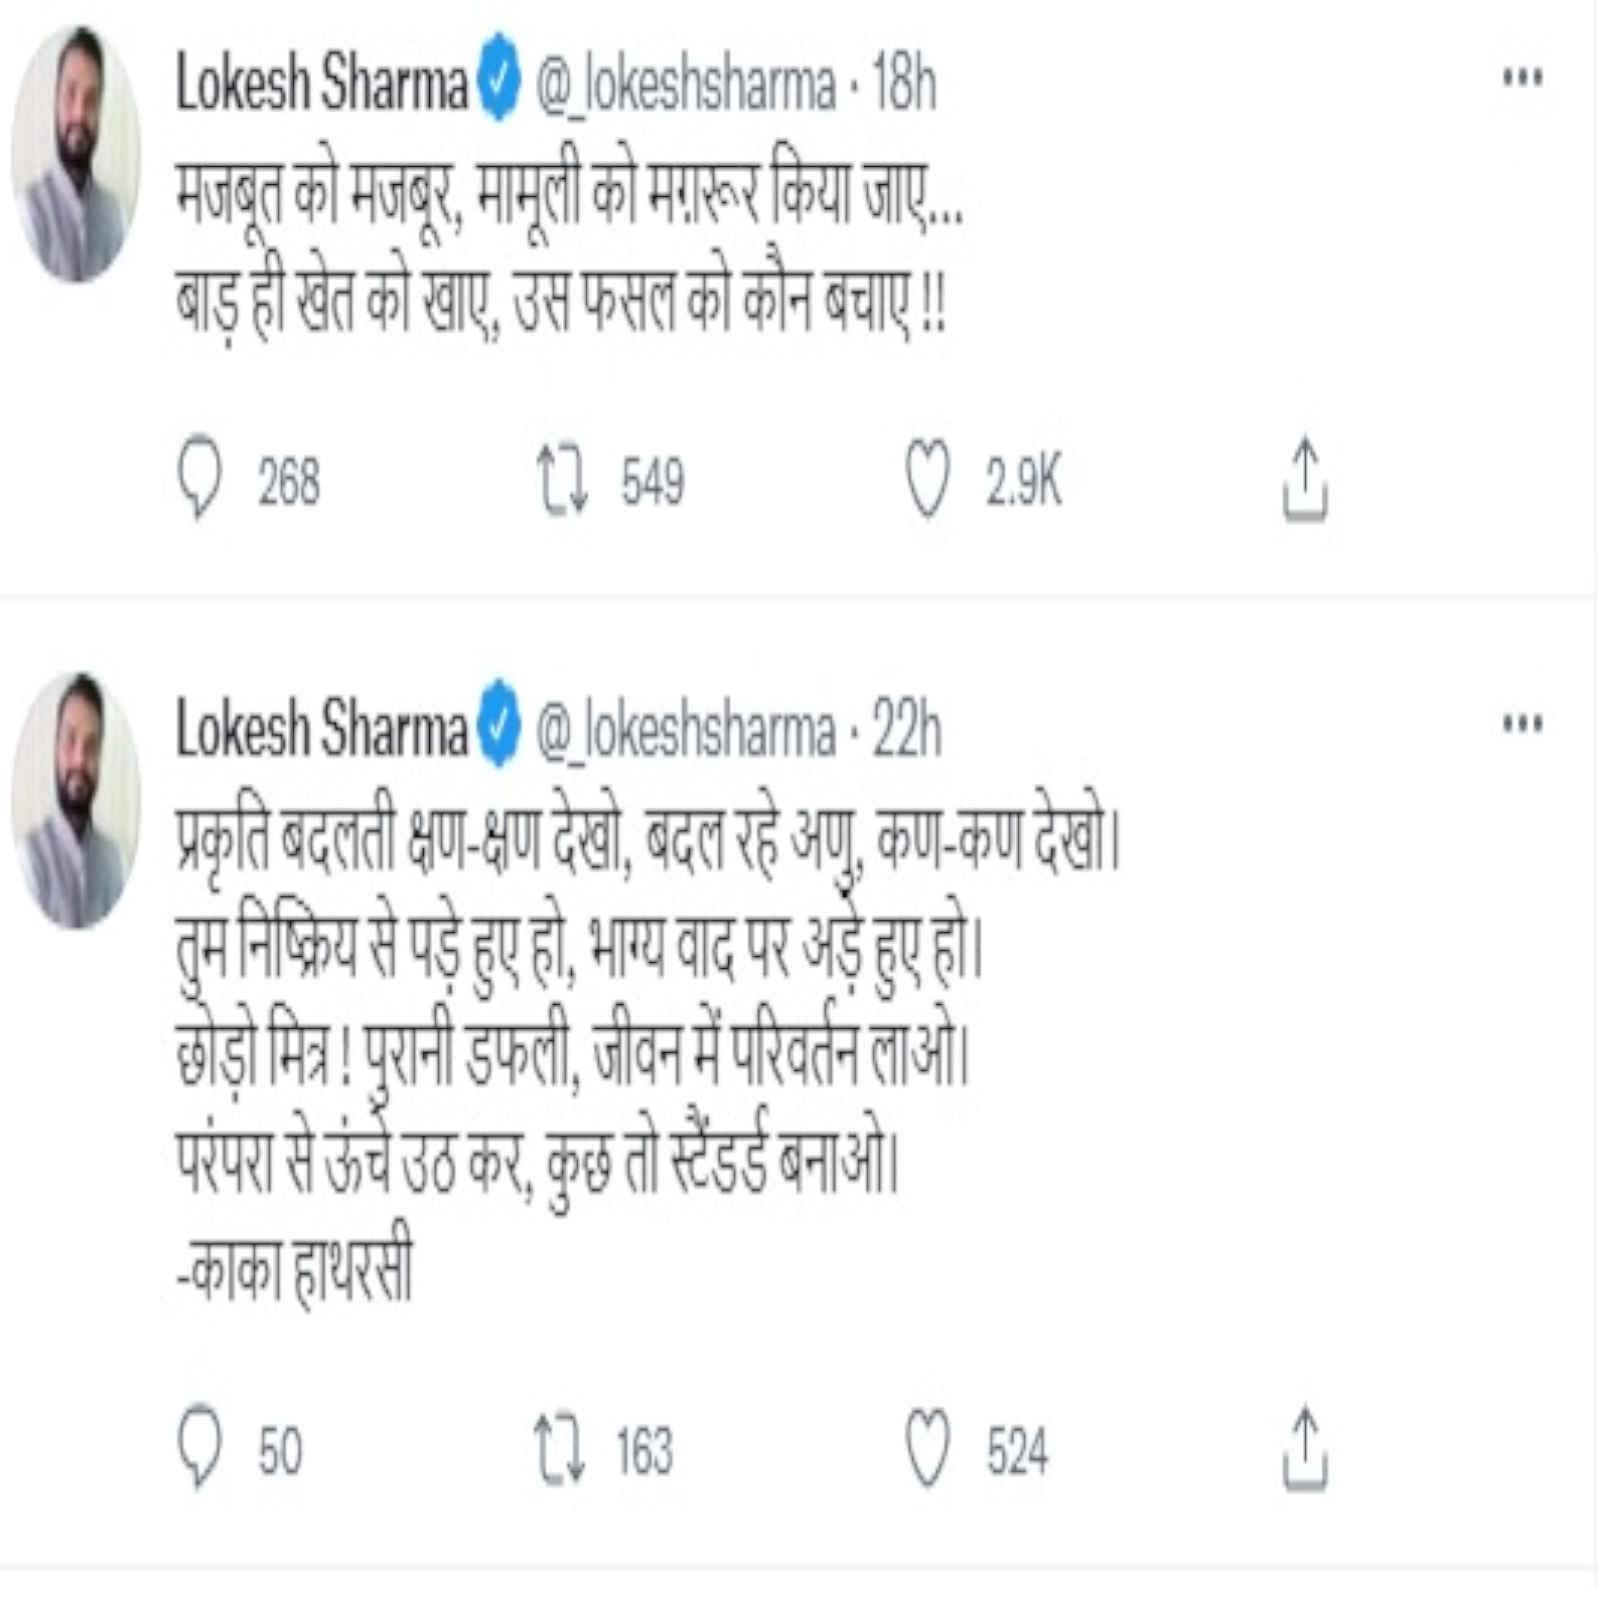 OSD Lokesh Sharma tweet, Amarinder Singh resignation, Congress Politics, Ashok Gehlot, अमरिंदर सिंह, लोकेश शर्मा, अशोक गहलोत, राजस्थान समाचार, जयपुर समाचार